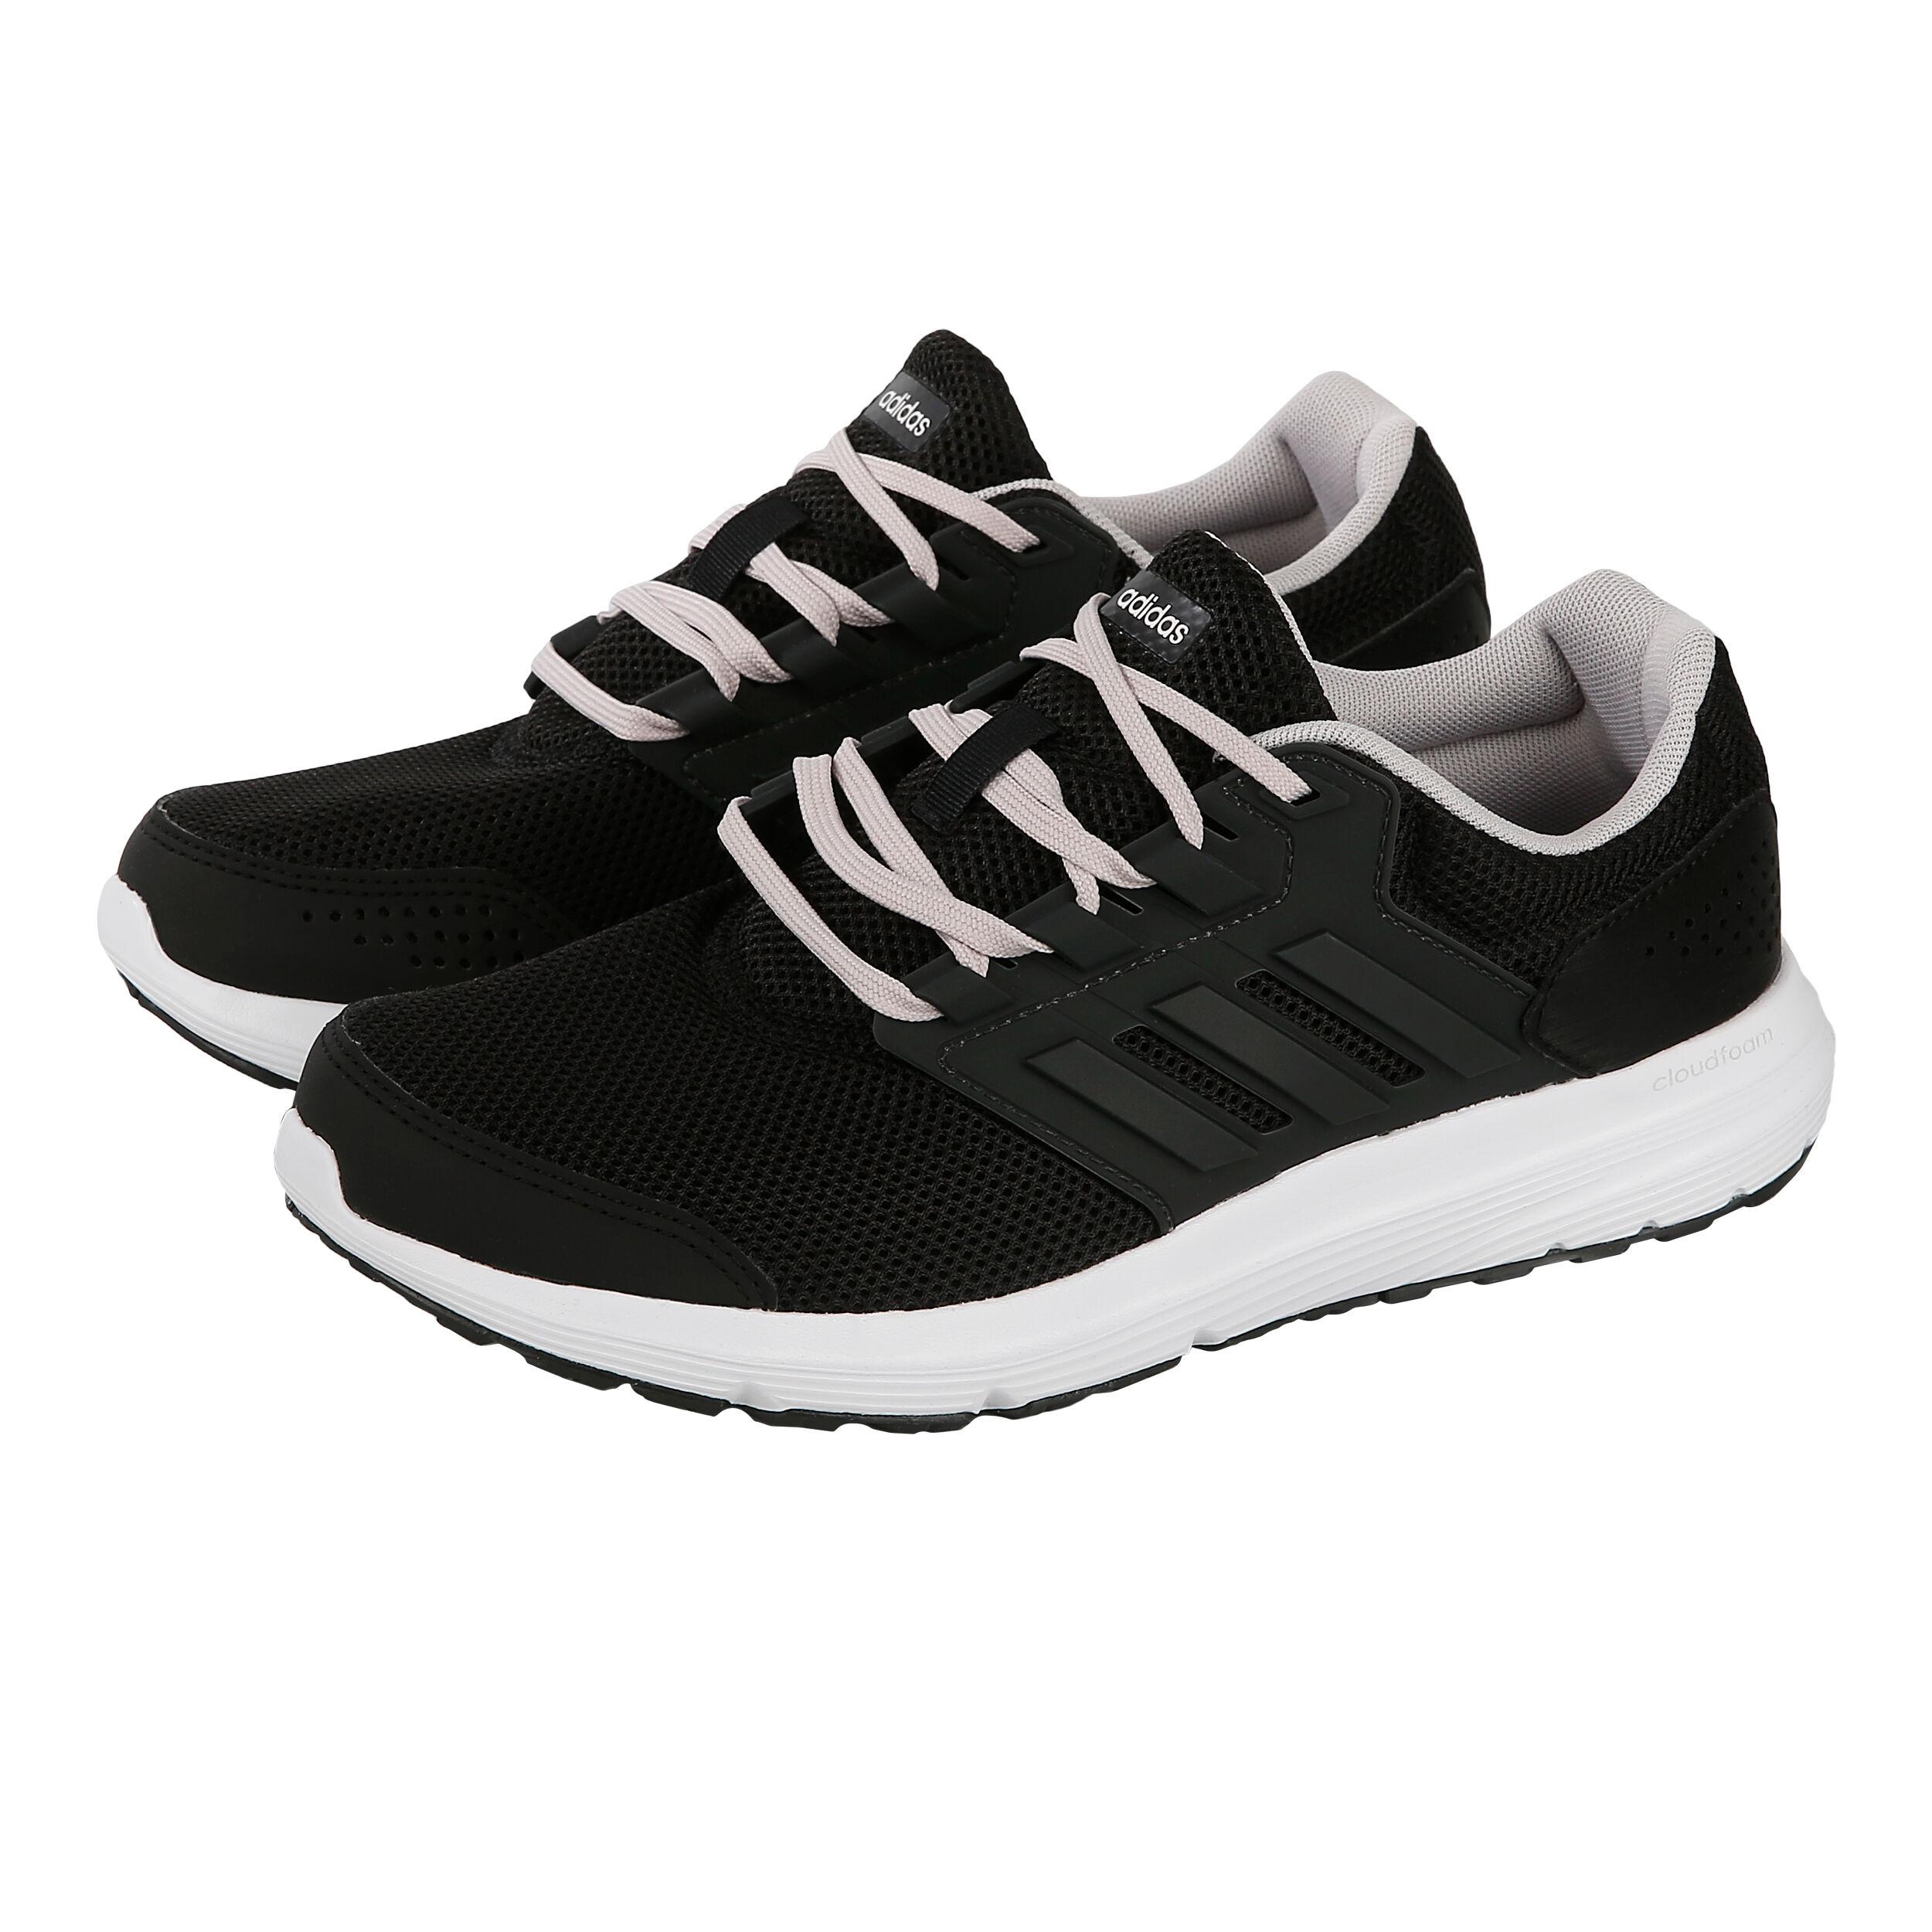 adidas jogging galaxy 4